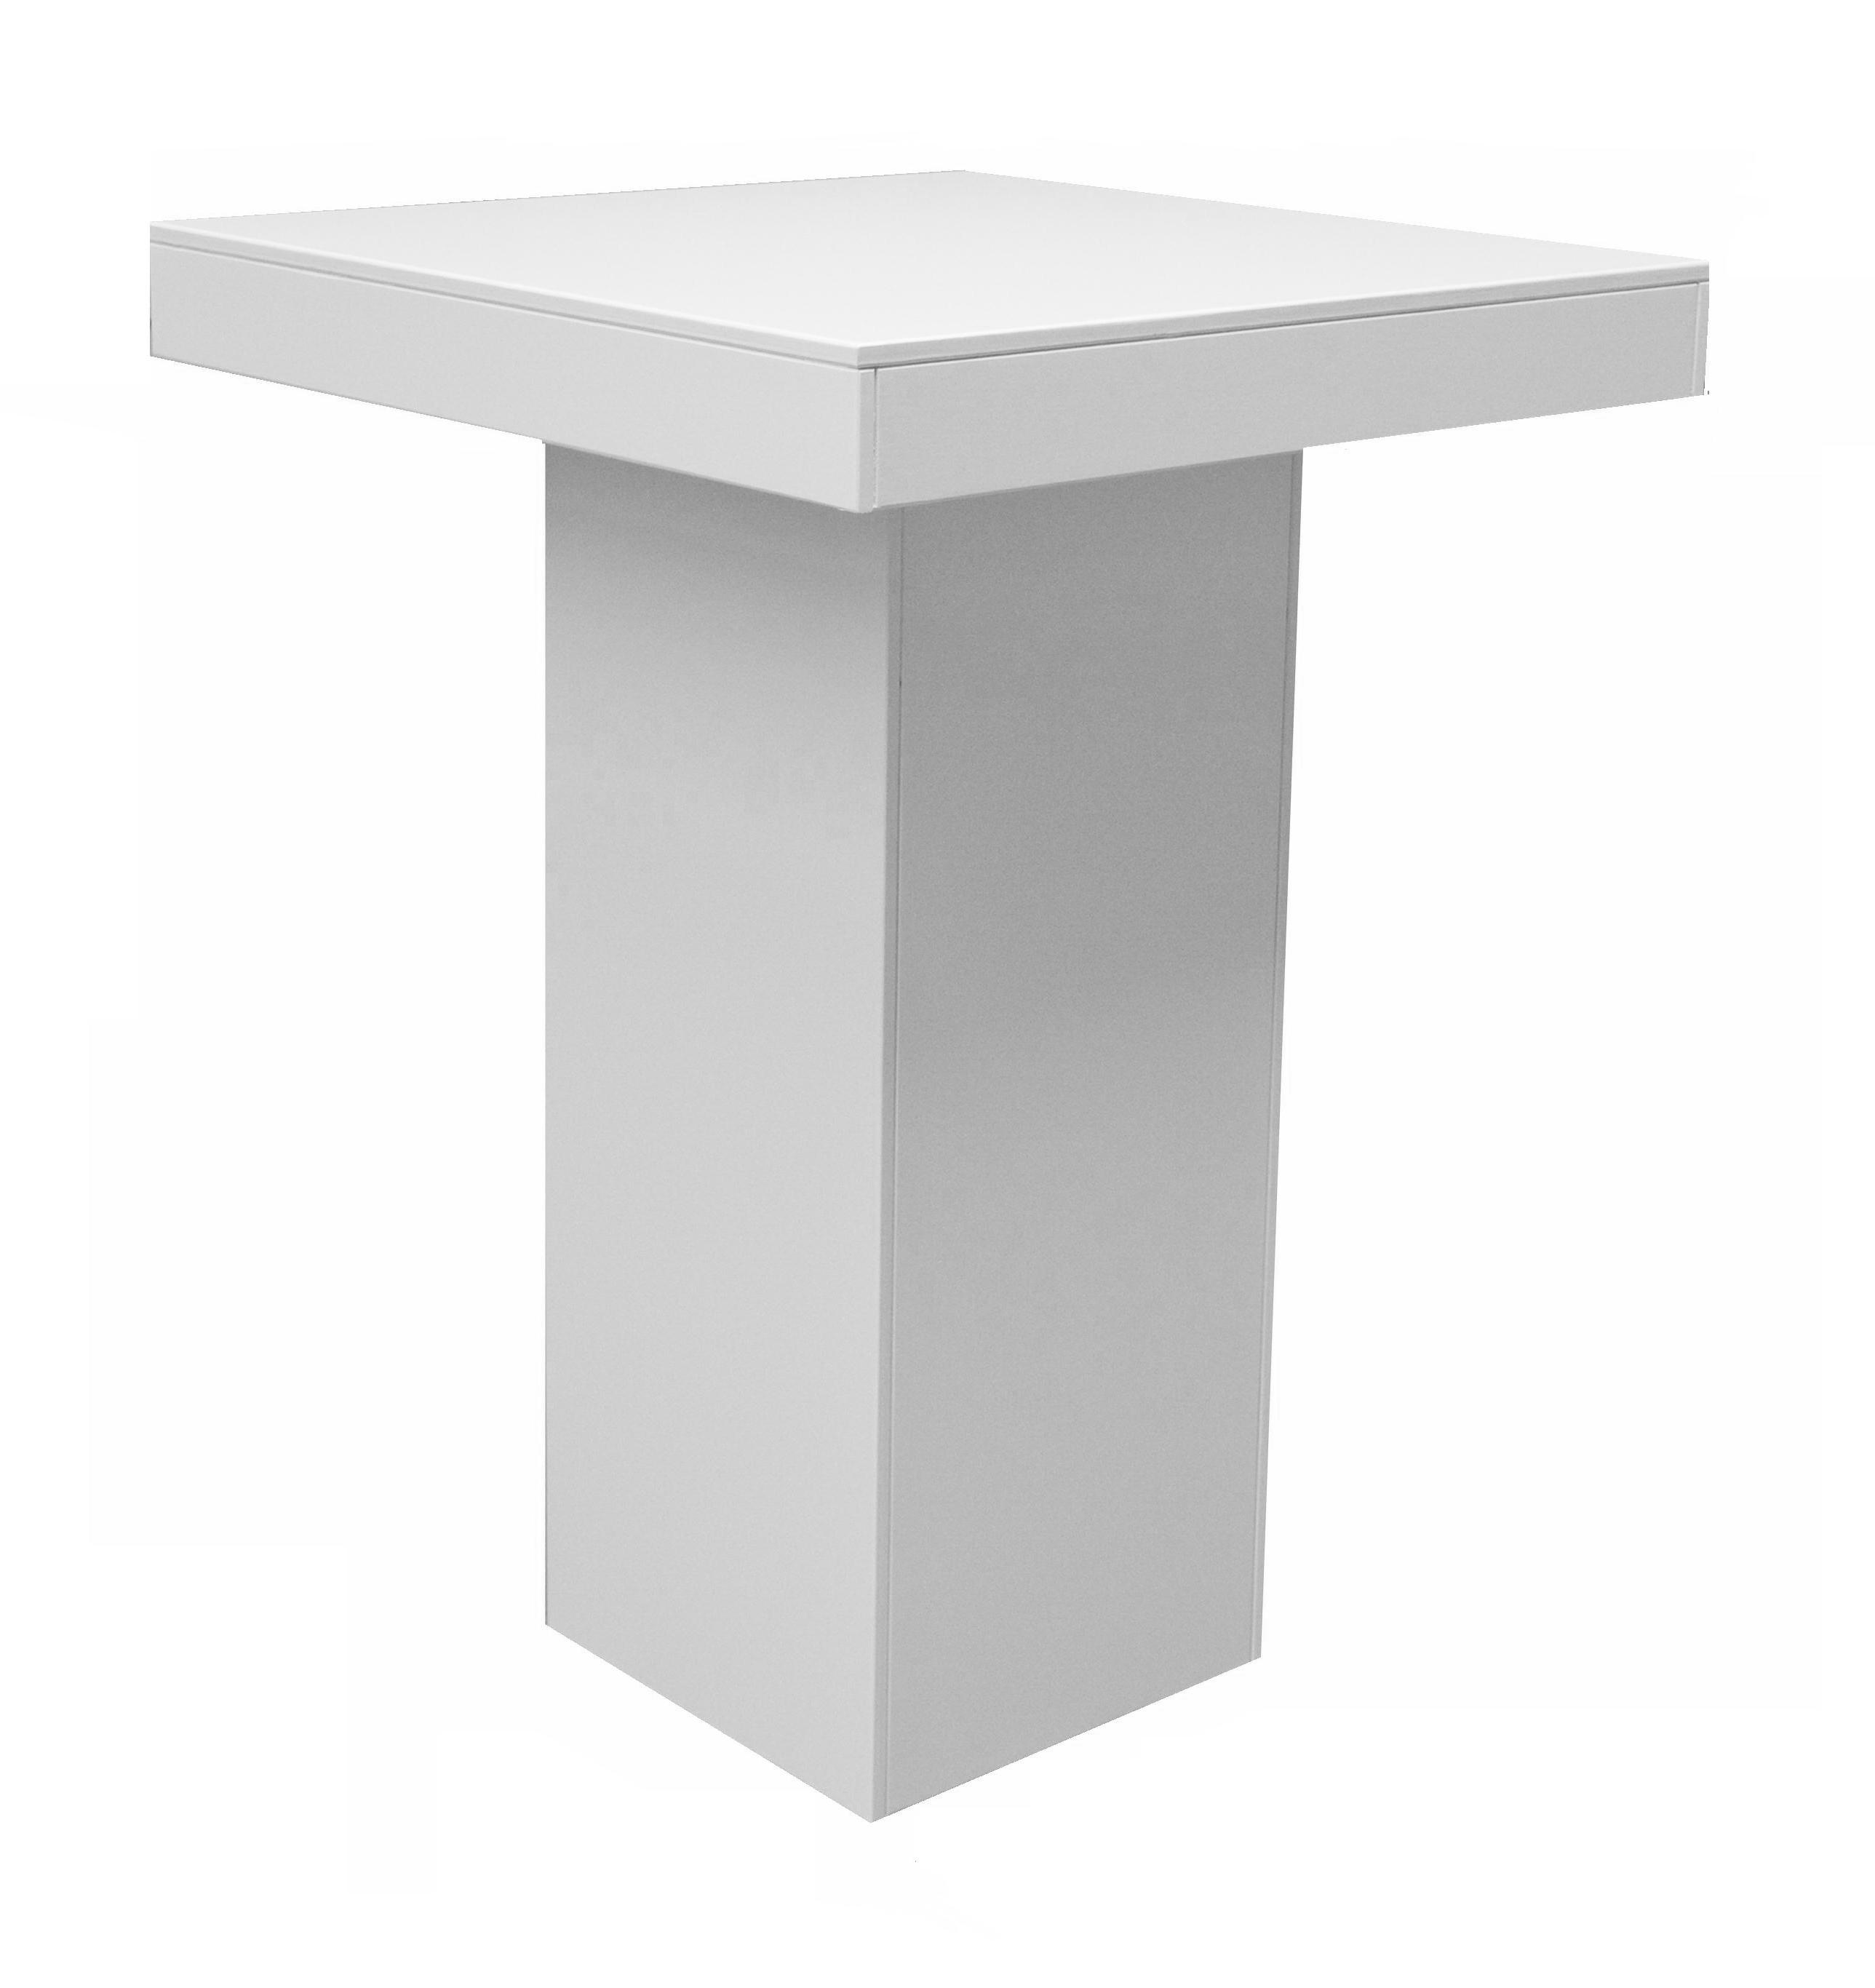 Moderne Witte Statafel.Luxe Witte Statafel Style Strakke Statafels